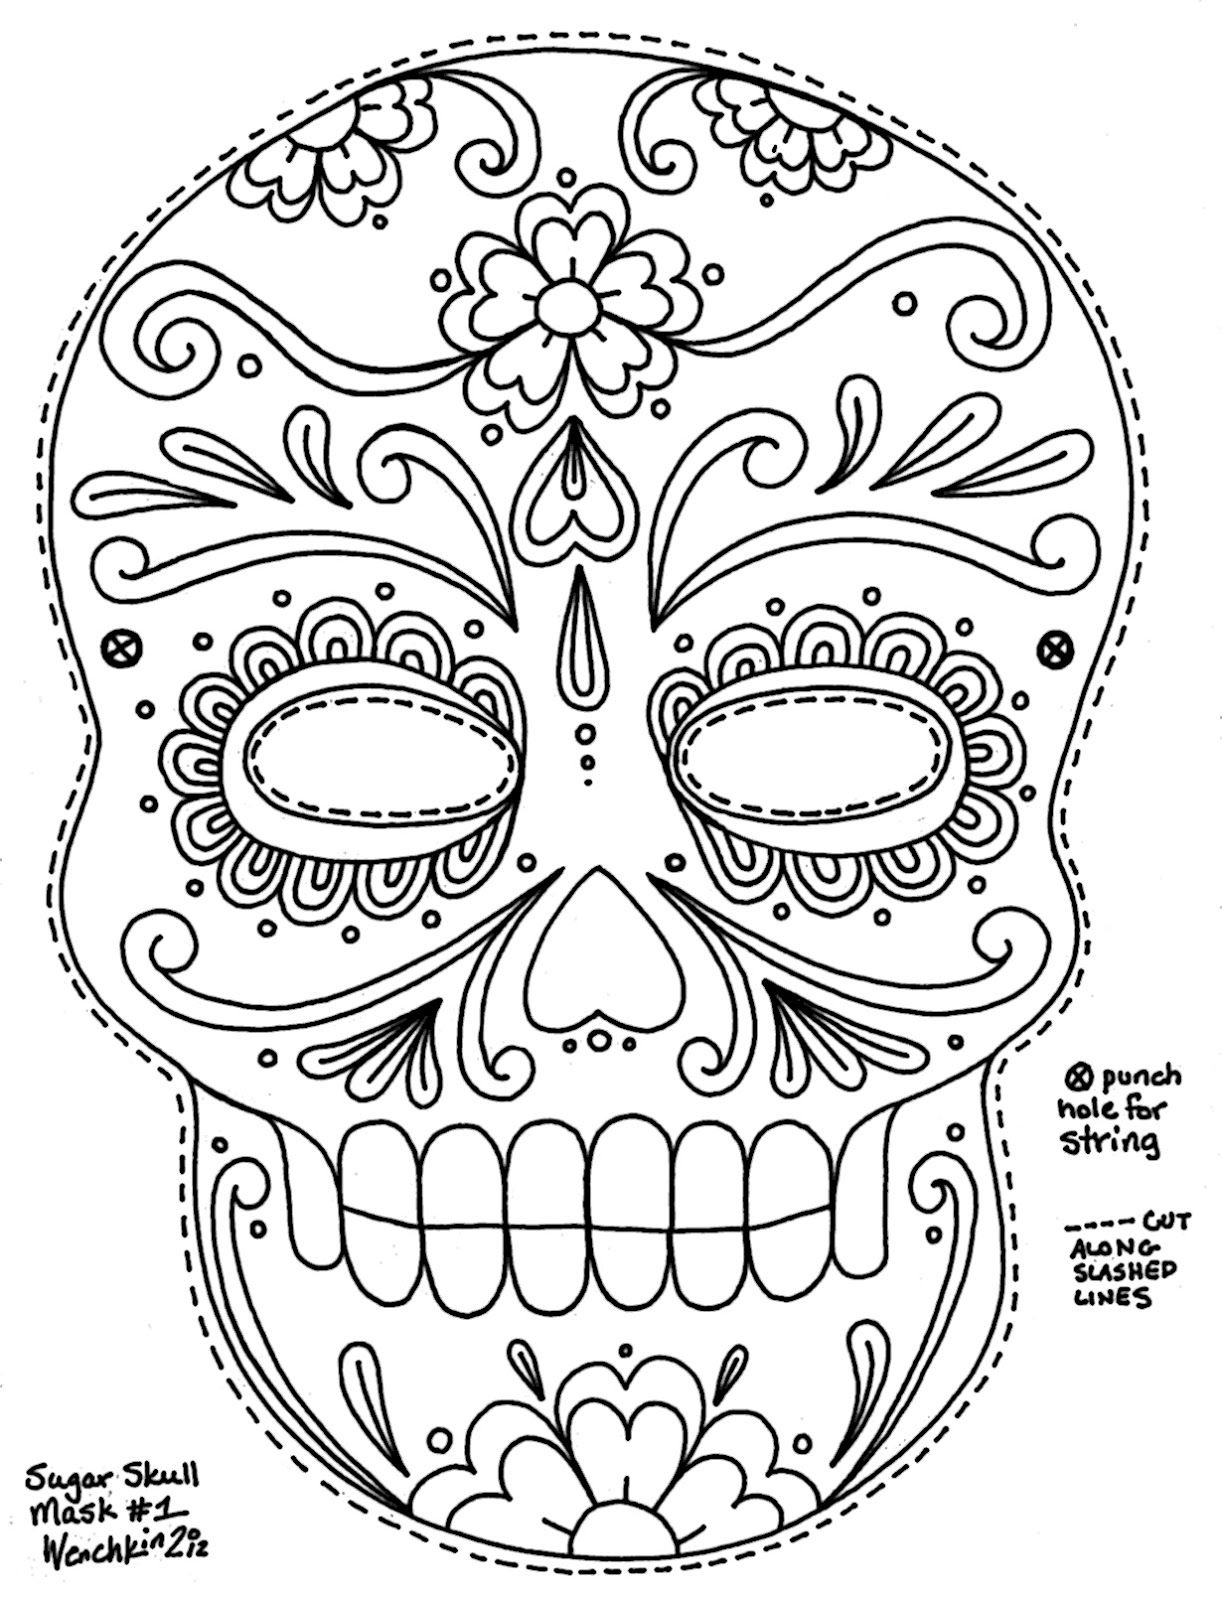 Free Printable Character Face Masks | Seasonal Activities | Skull - Free Printable Sugar Skull Day Of The Dead Mask